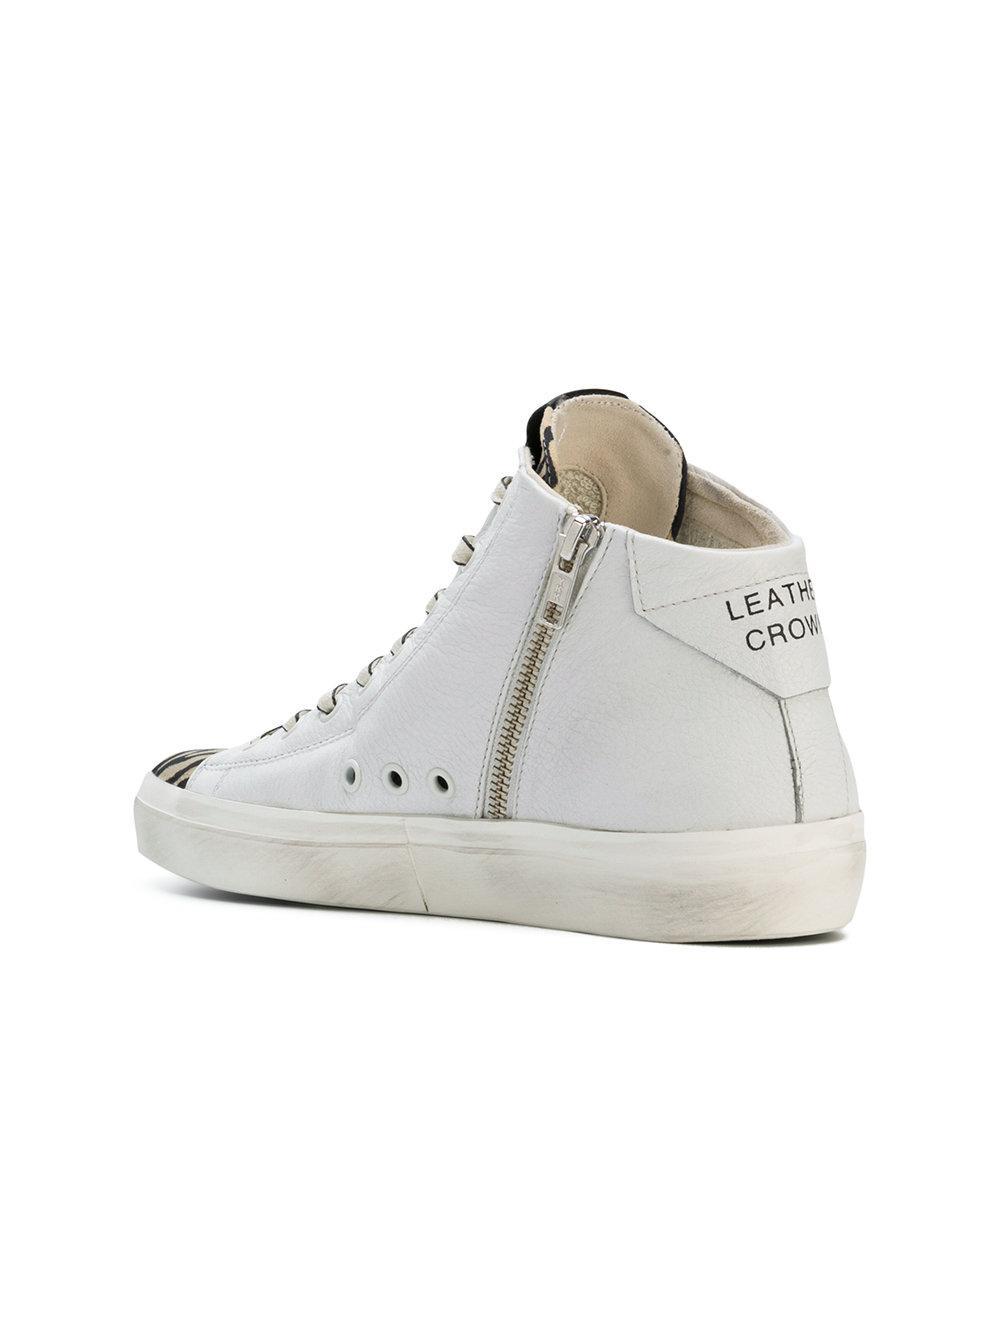 hi-top zebra sneakers - White Leather Crown Ko4aBFbA